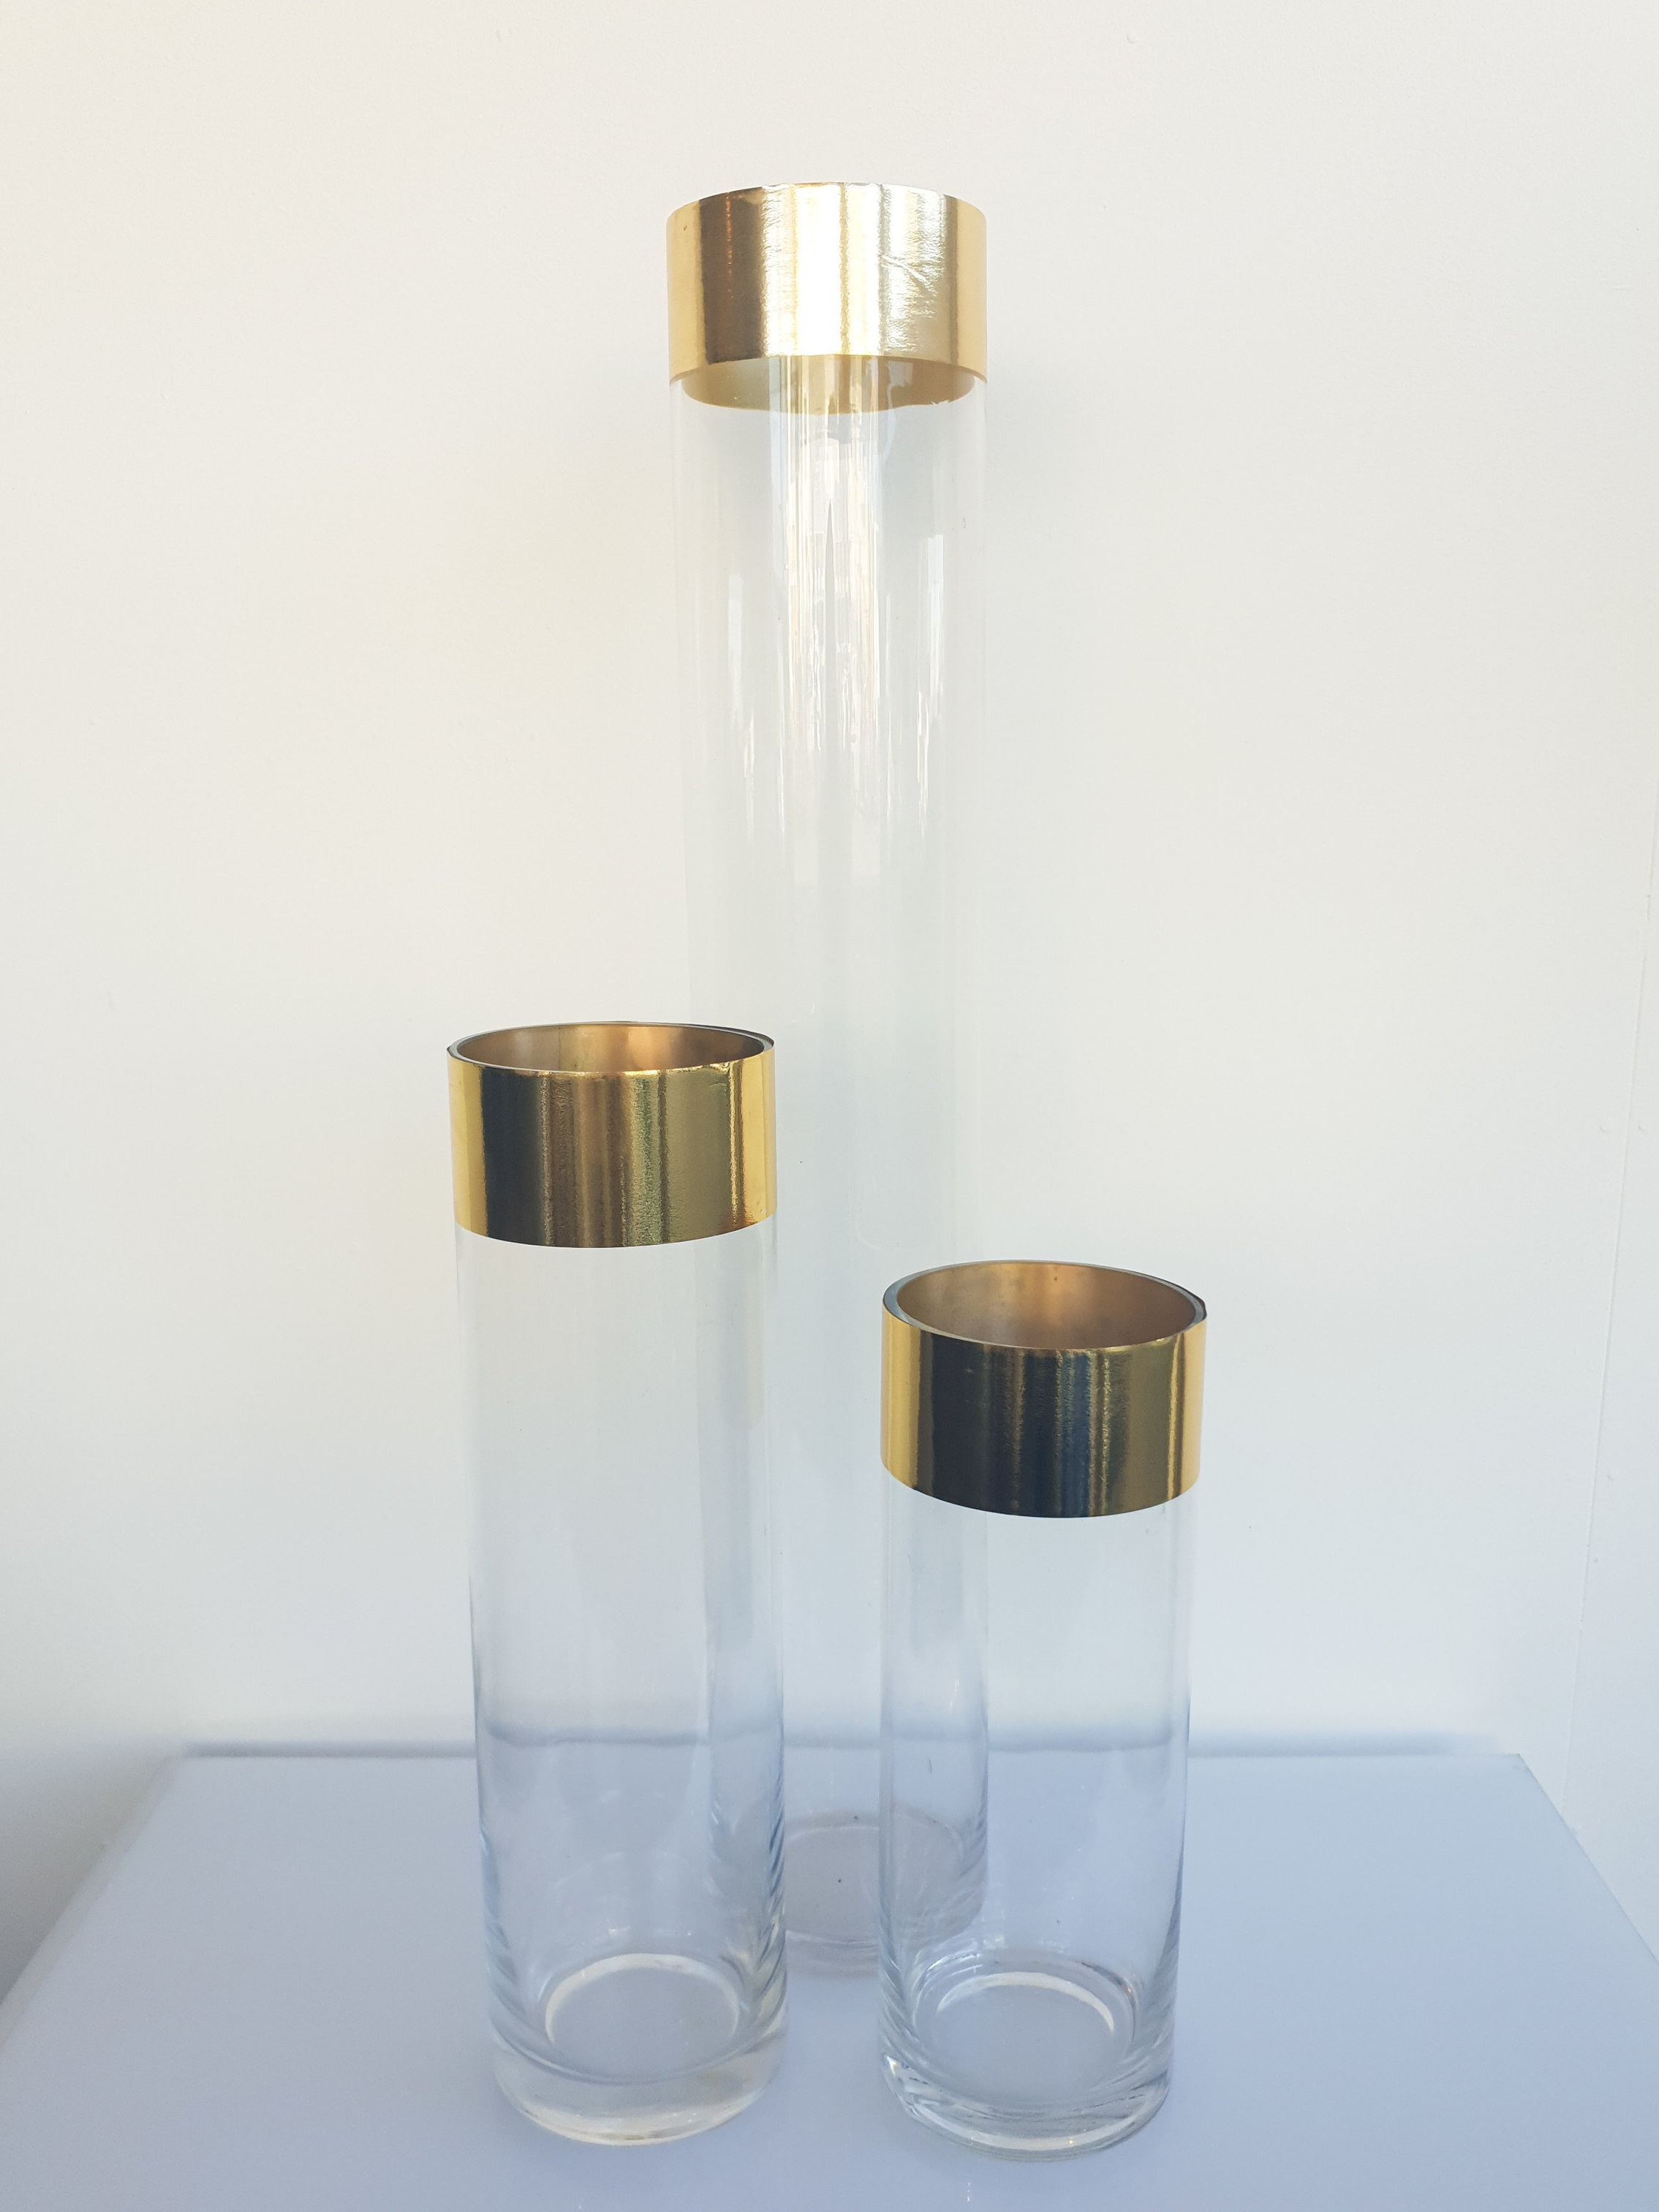 GOLD EDGE GLASS CYLINDER VASE 20 CM H $8+GST 25 CM H $8+GST 30 CM H $10+GST 40 CM H $12+GST 60 CM H $15+GST